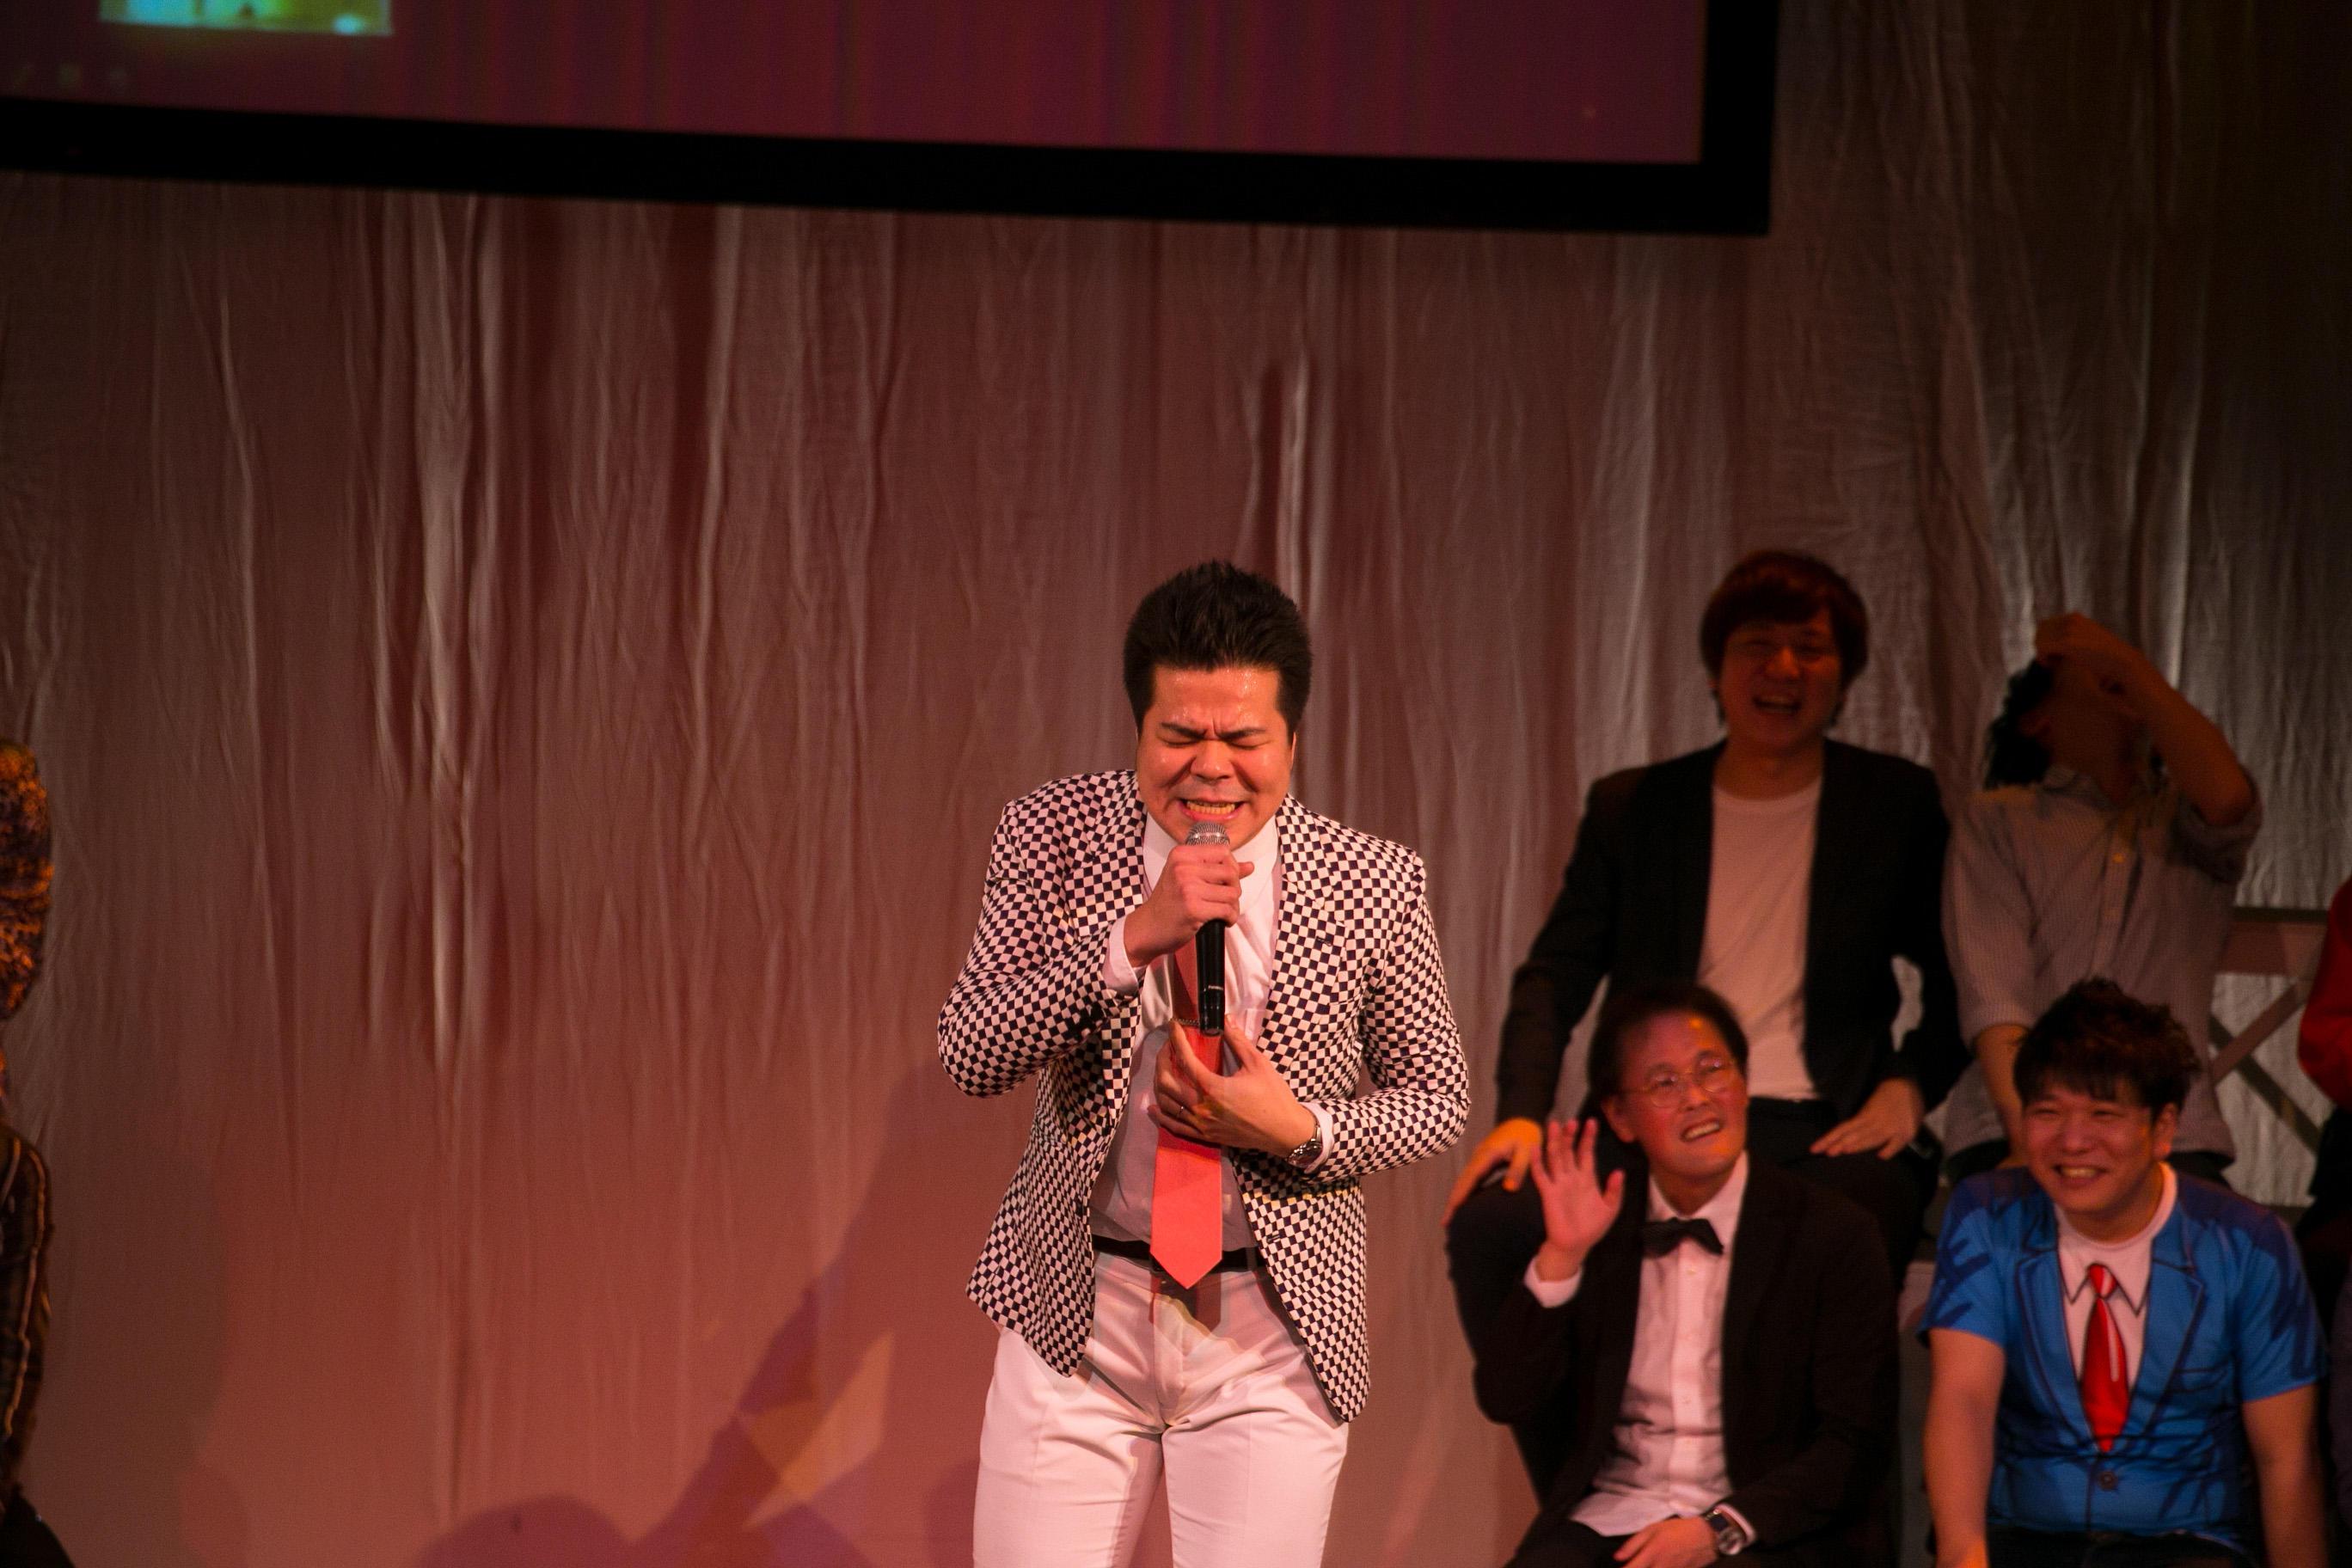 http://news.yoshimoto.co.jp/20181228112410-82df0afca6ee4a60de192f46bf22c339ab493f7d.jpg